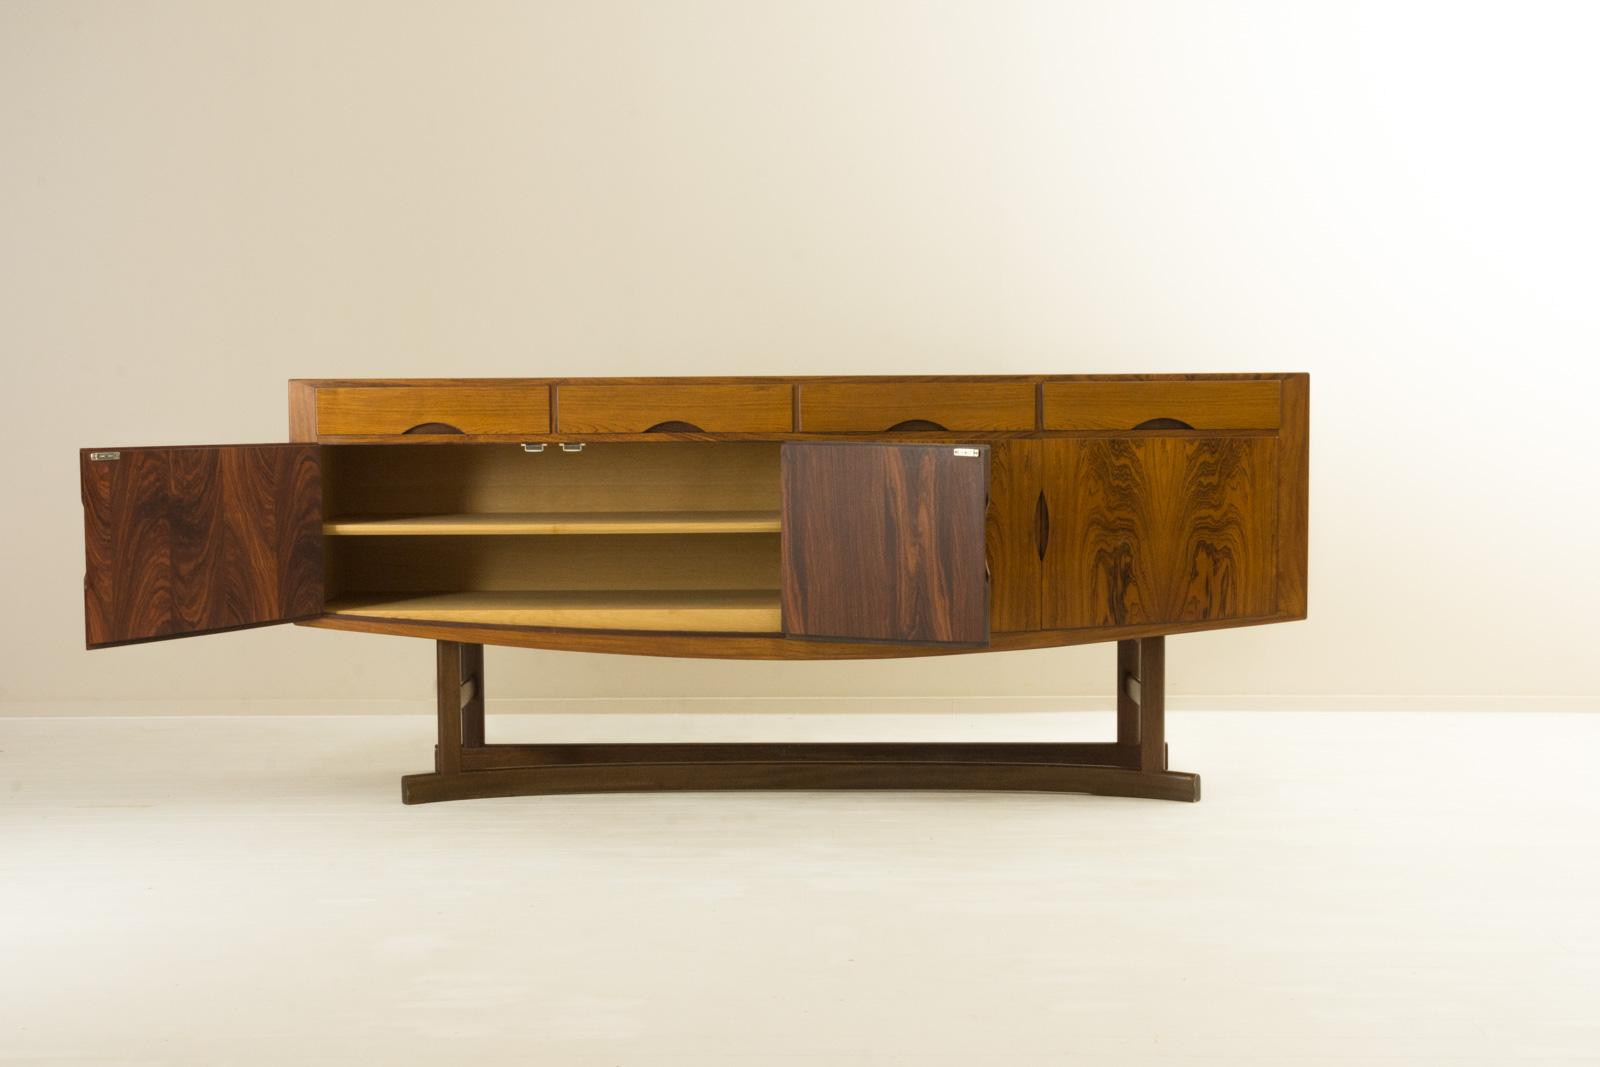 HB20 Sideboard by Johannes Andersen